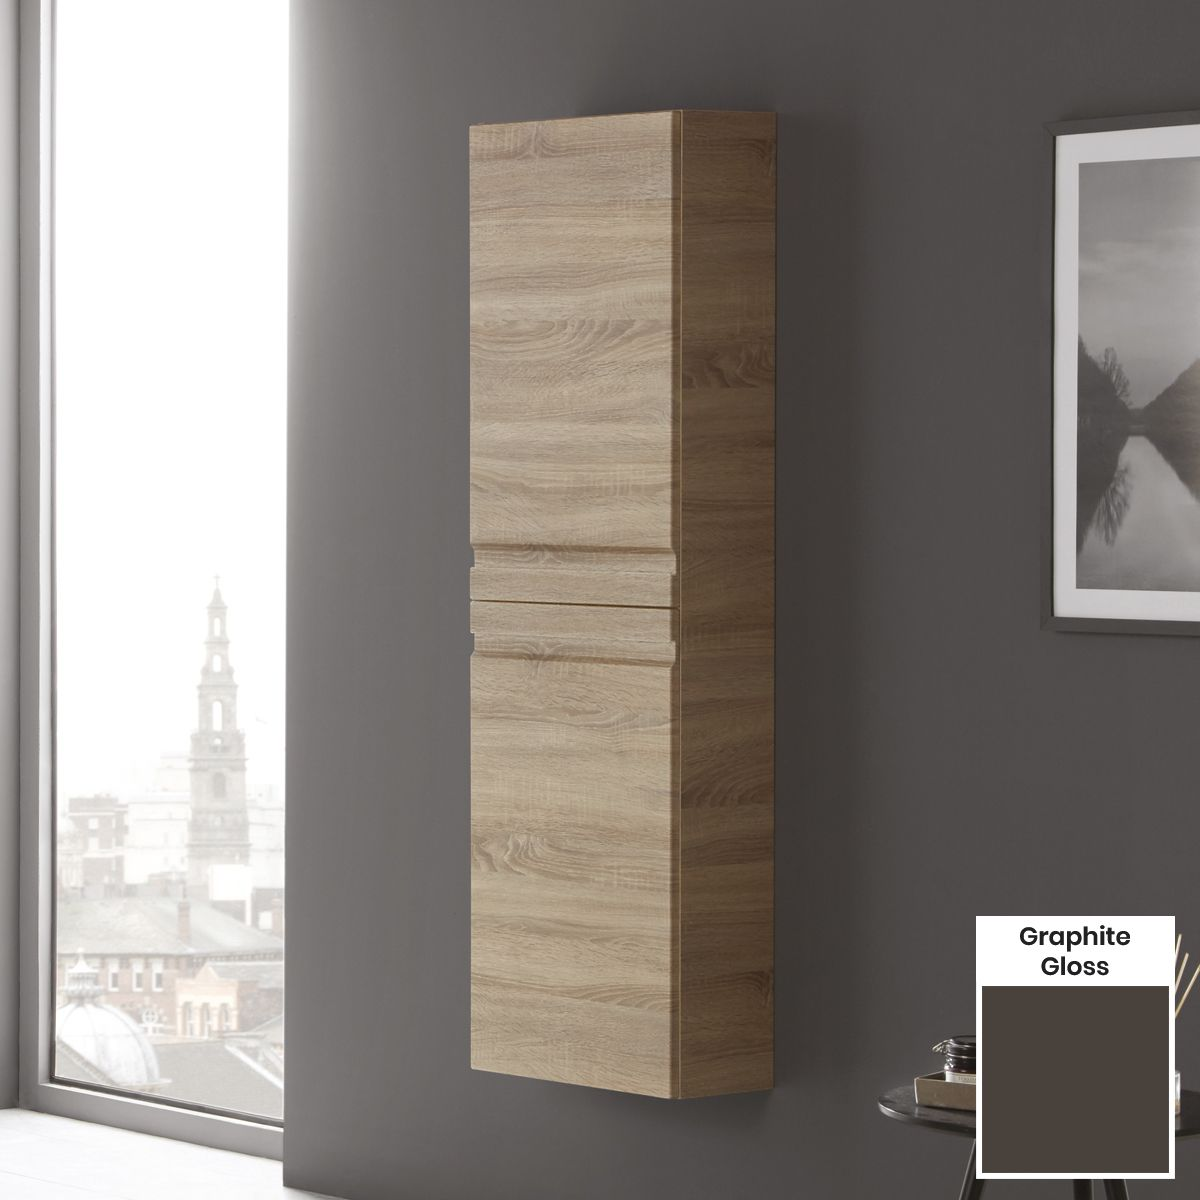 Elation Eko Graphite Gloss Tall Unit with Slab Door 1500mm